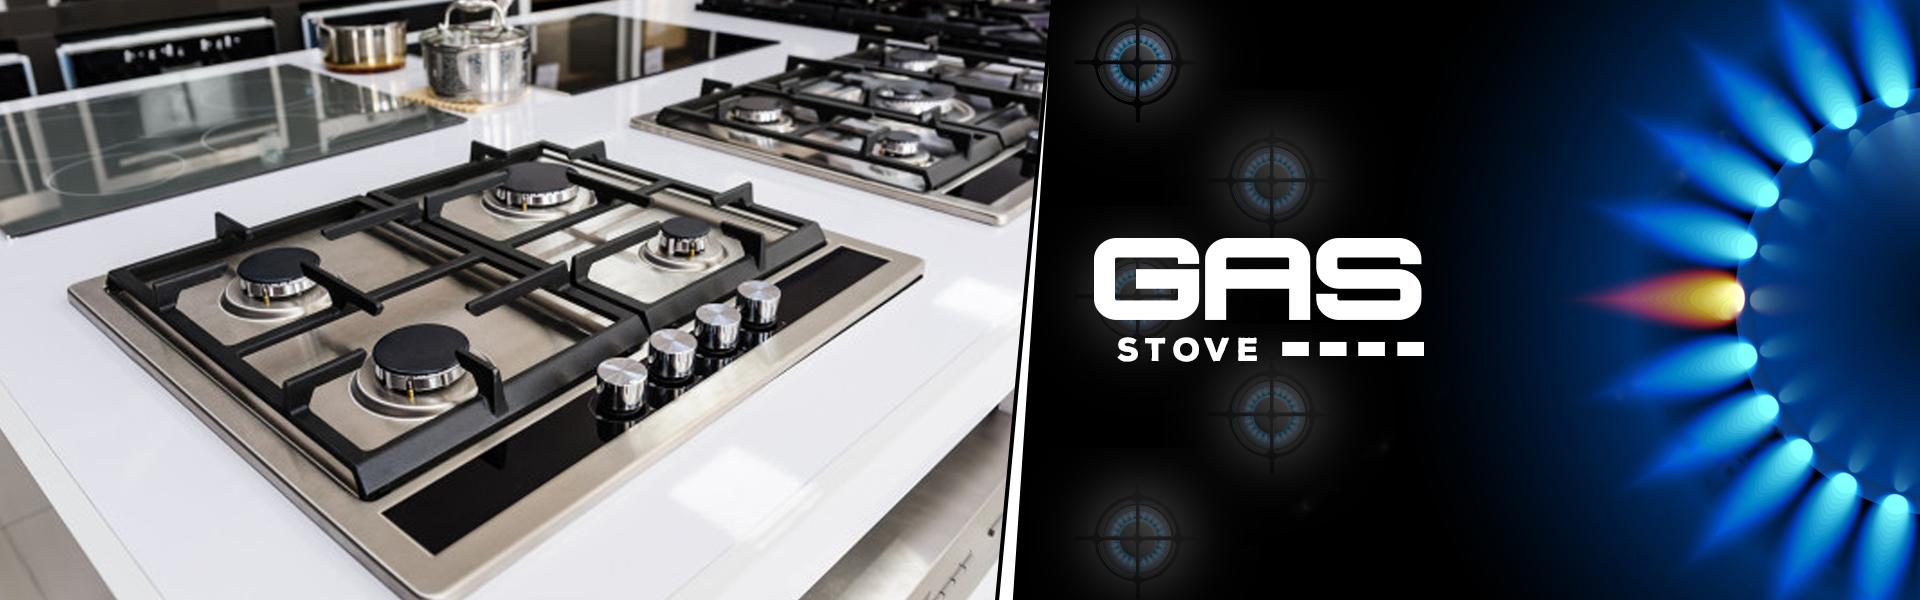 Gas stove_1920x600